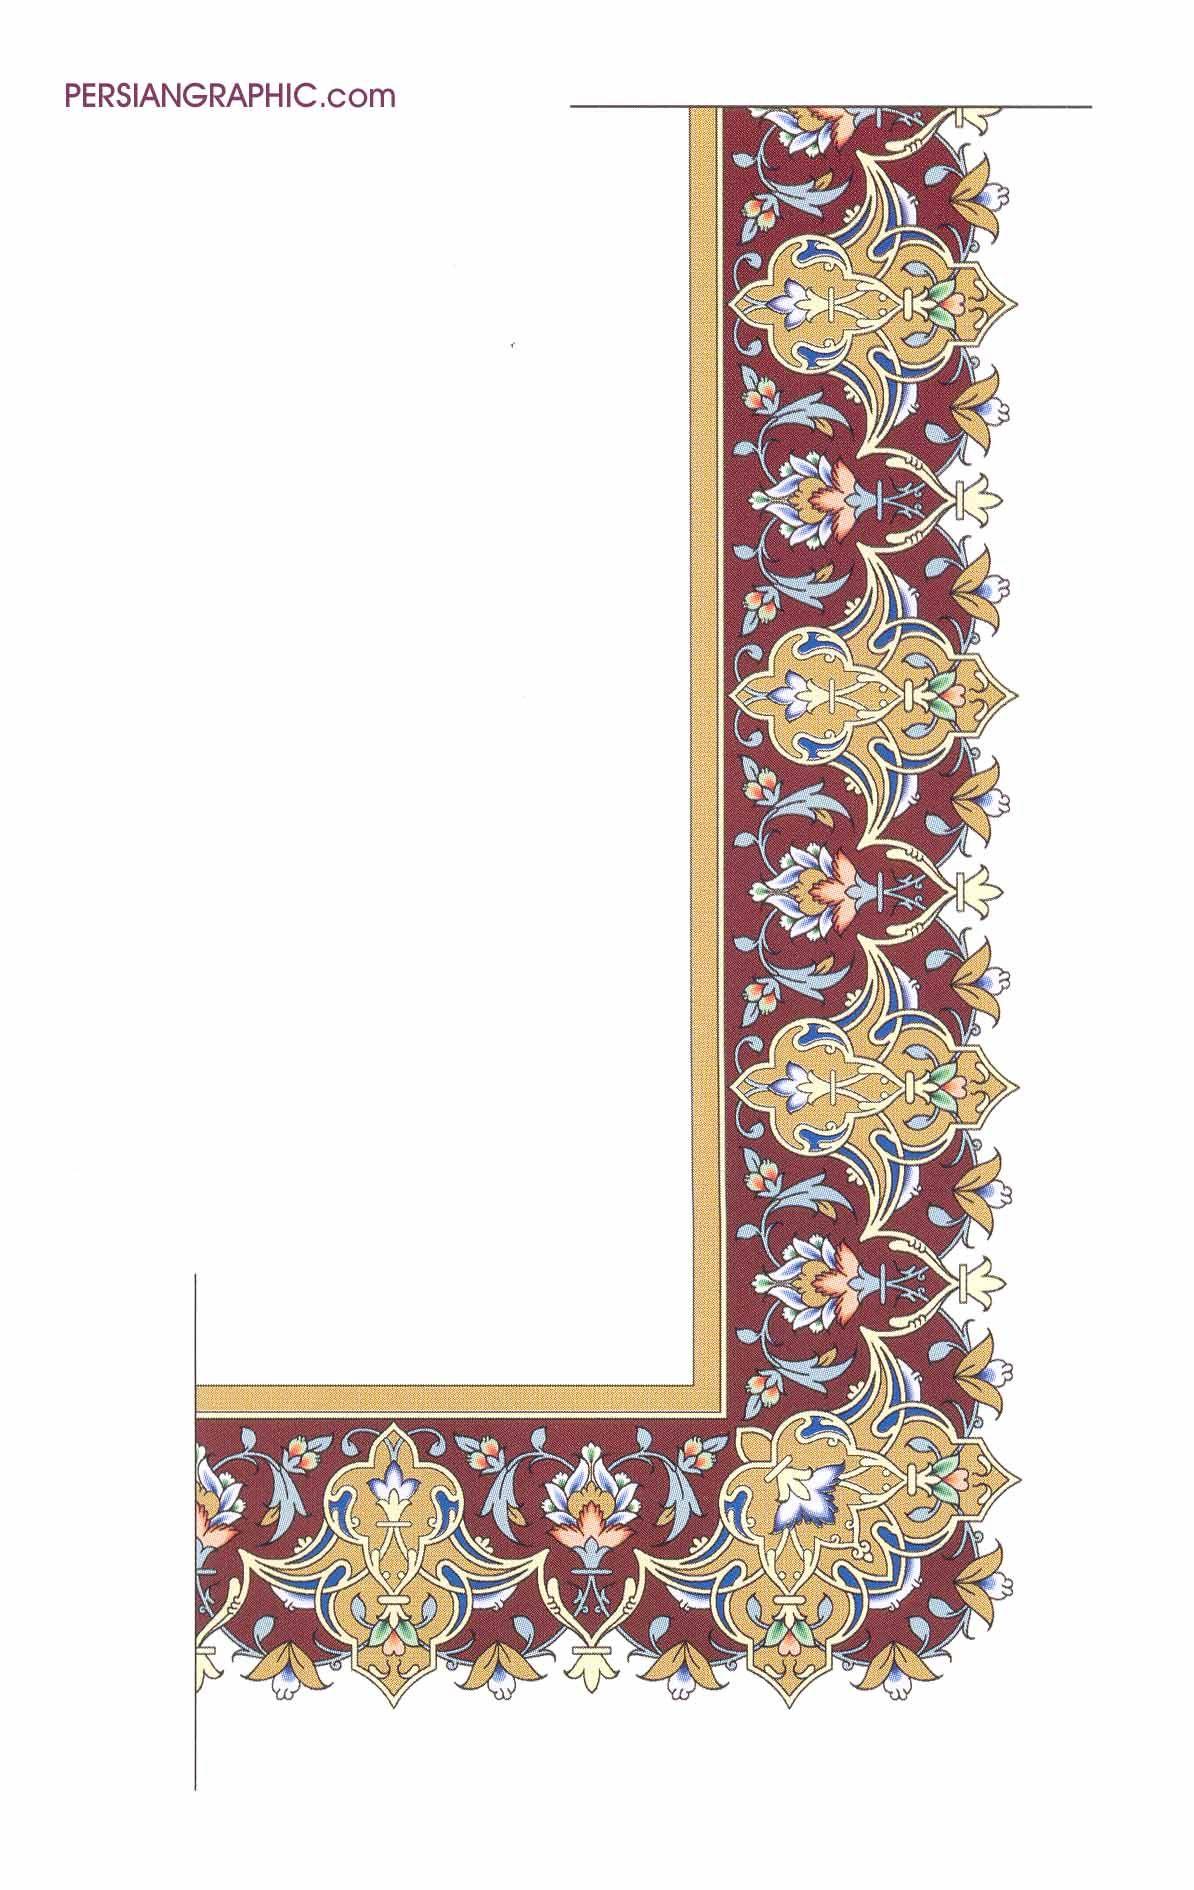 Ornate, Fancy, Islamic Art, Geometric, Pretty, Hand Drawn